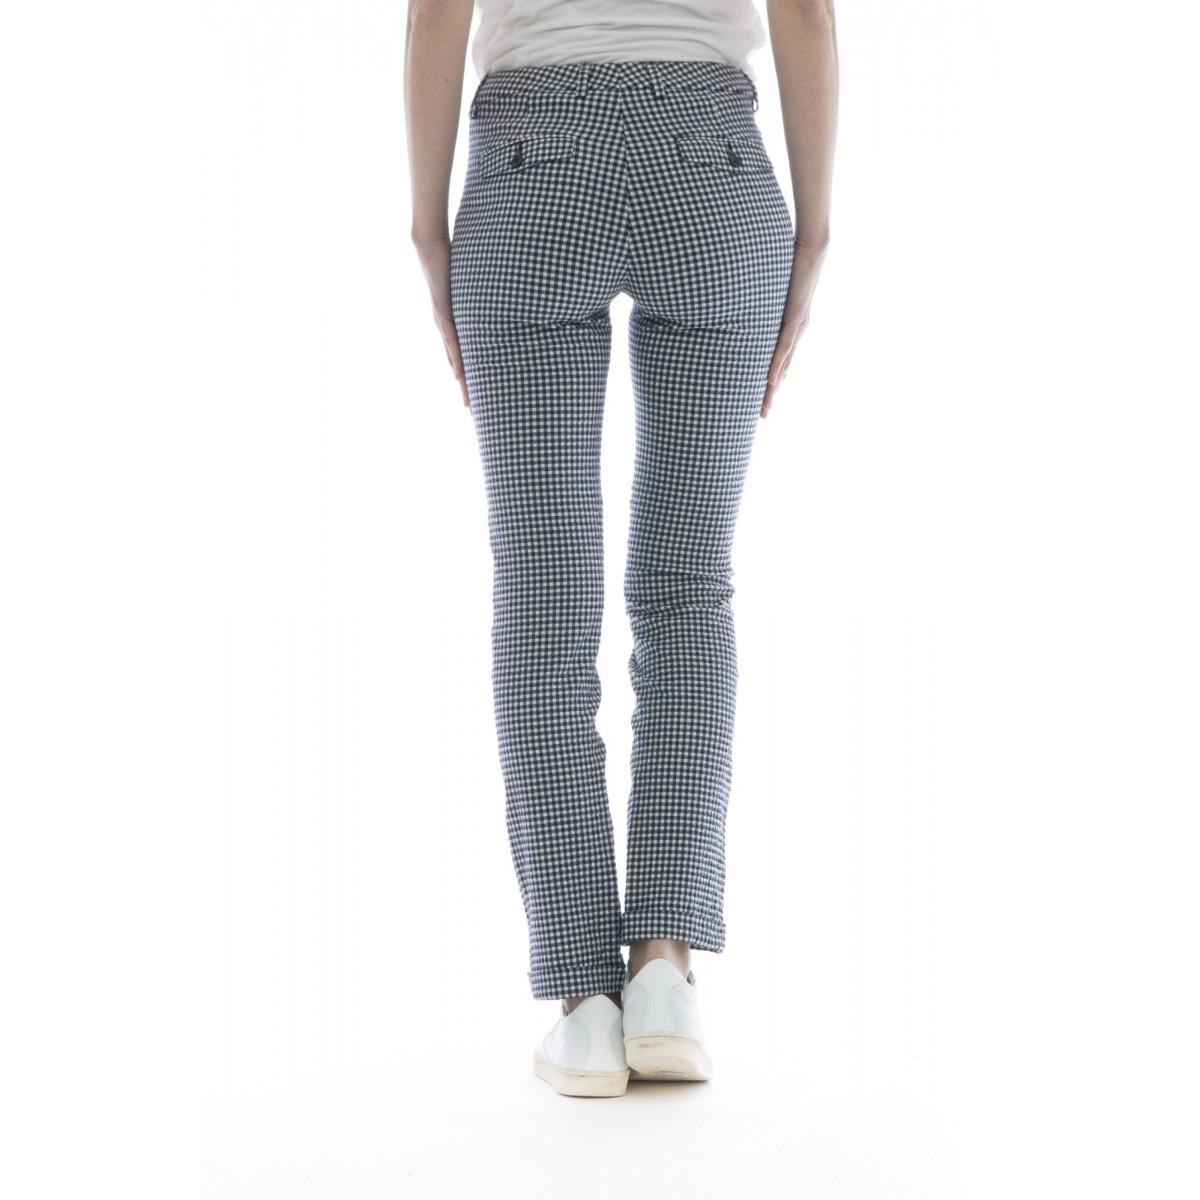 Pantalone donna - Leyre 172568 d6243 seersucker bistrech 96% cotone, 3%elastane, 1% polia